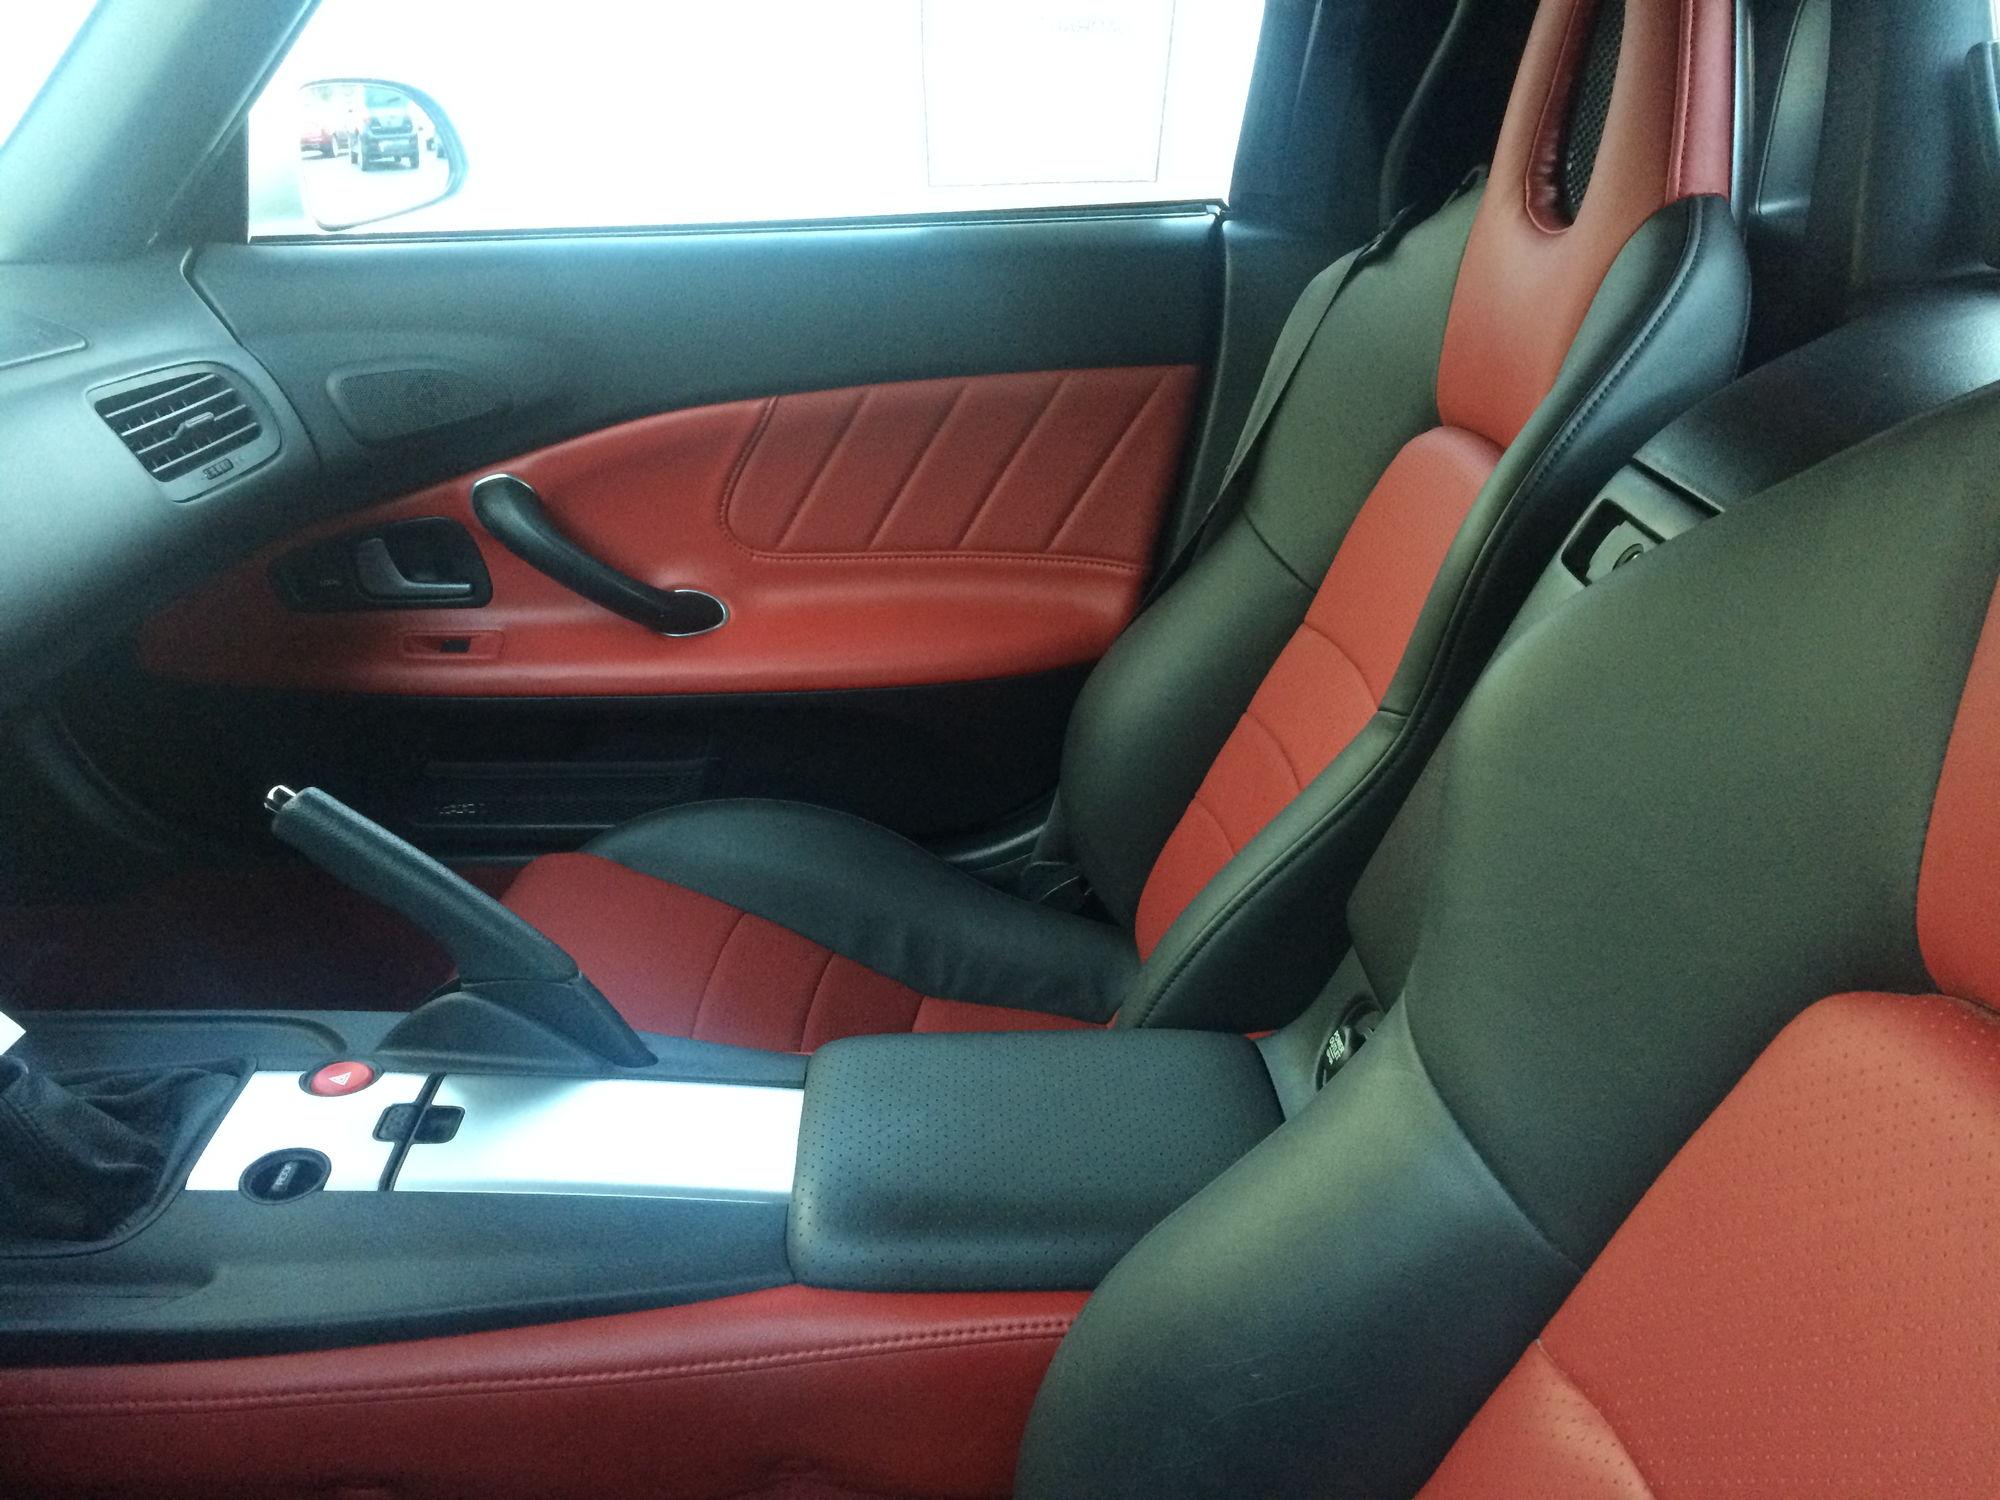 oh 05 ap2 silver w red black interior 15 890 miles for sale s2ki honda s2000 forums. Black Bedroom Furniture Sets. Home Design Ideas